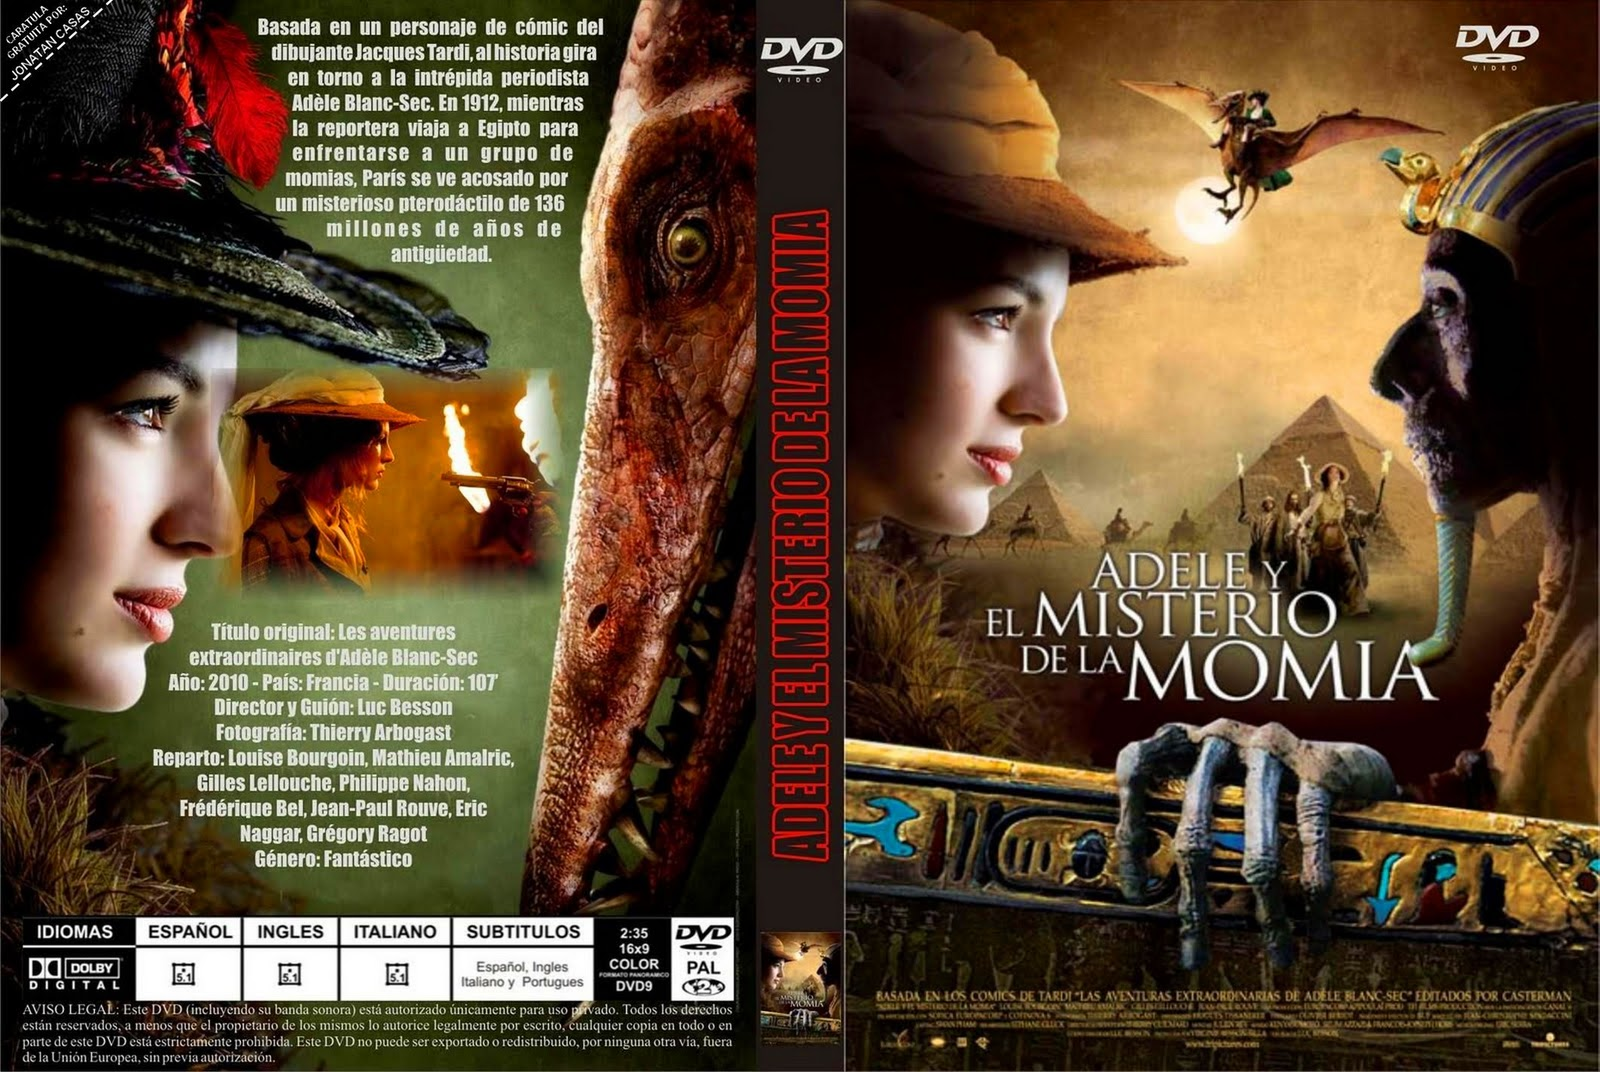 http://1.bp.blogspot.com/_HiExBHZSBzs/TTzHId629UI/AAAAAAAAAMI/erHtuK1R4Ho/s1600/Adele+Y+El+Misterio+De+La+Momia+%255B%255D.jpg